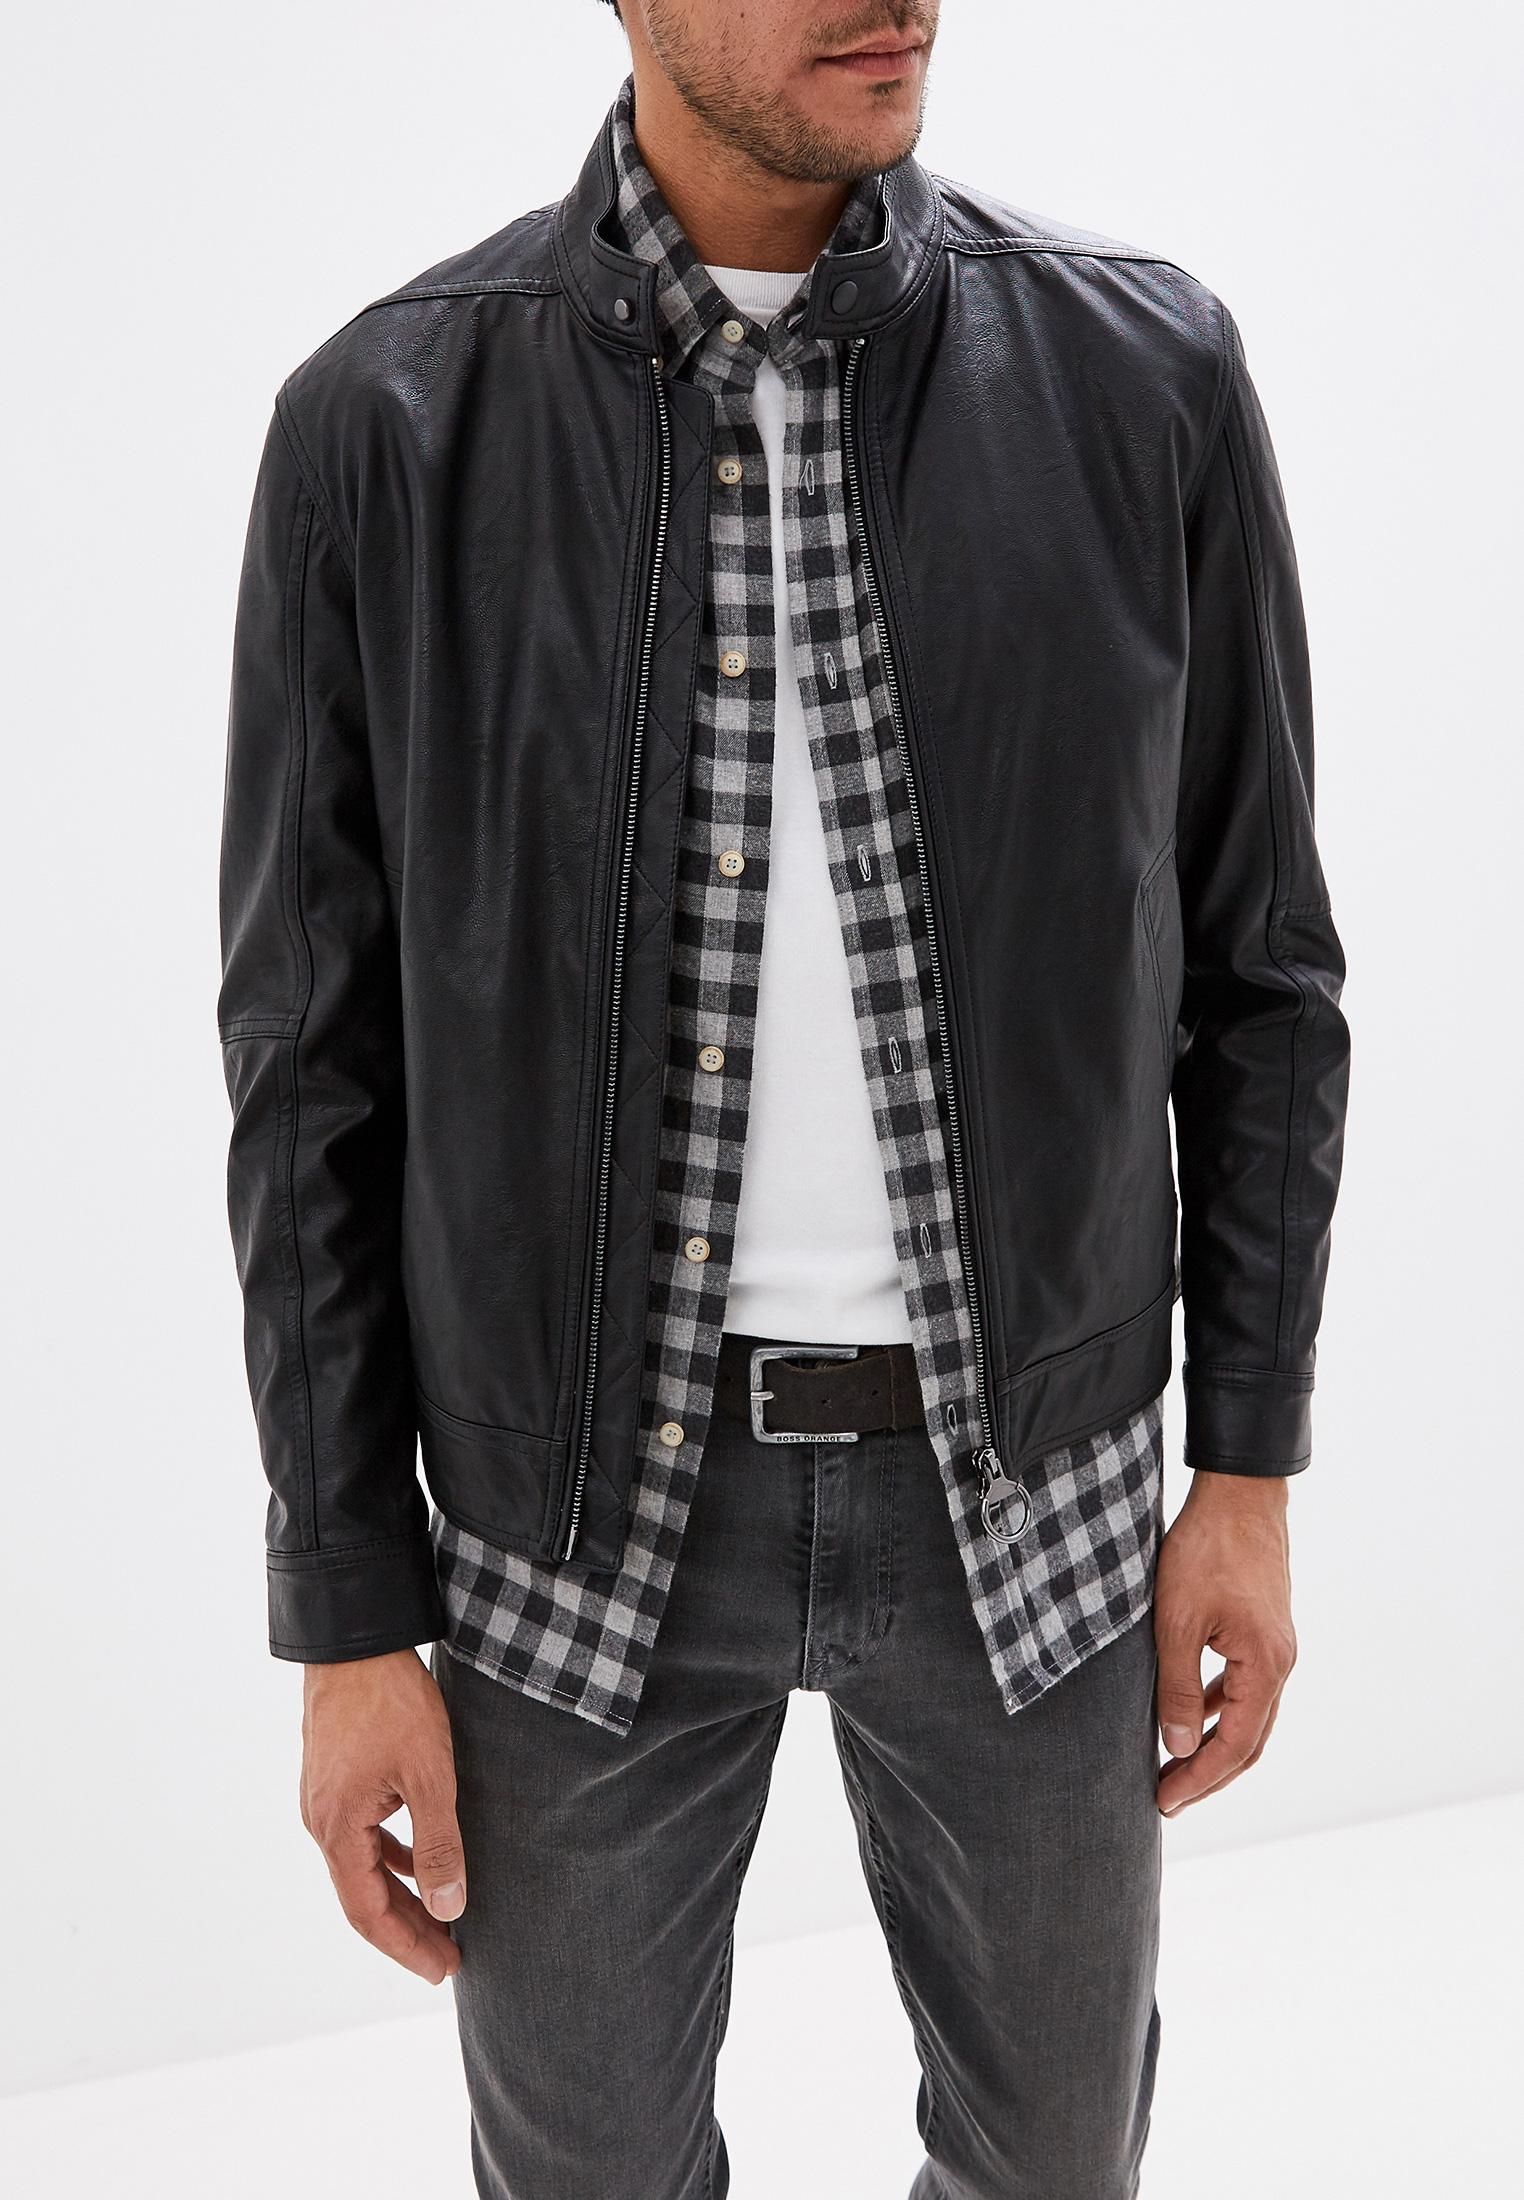 Куртка кожаная, Sisley, цвет: черный. Артикул: SI007EMFUGB9. Одежда / Верхняя одежда / Кожаные куртки